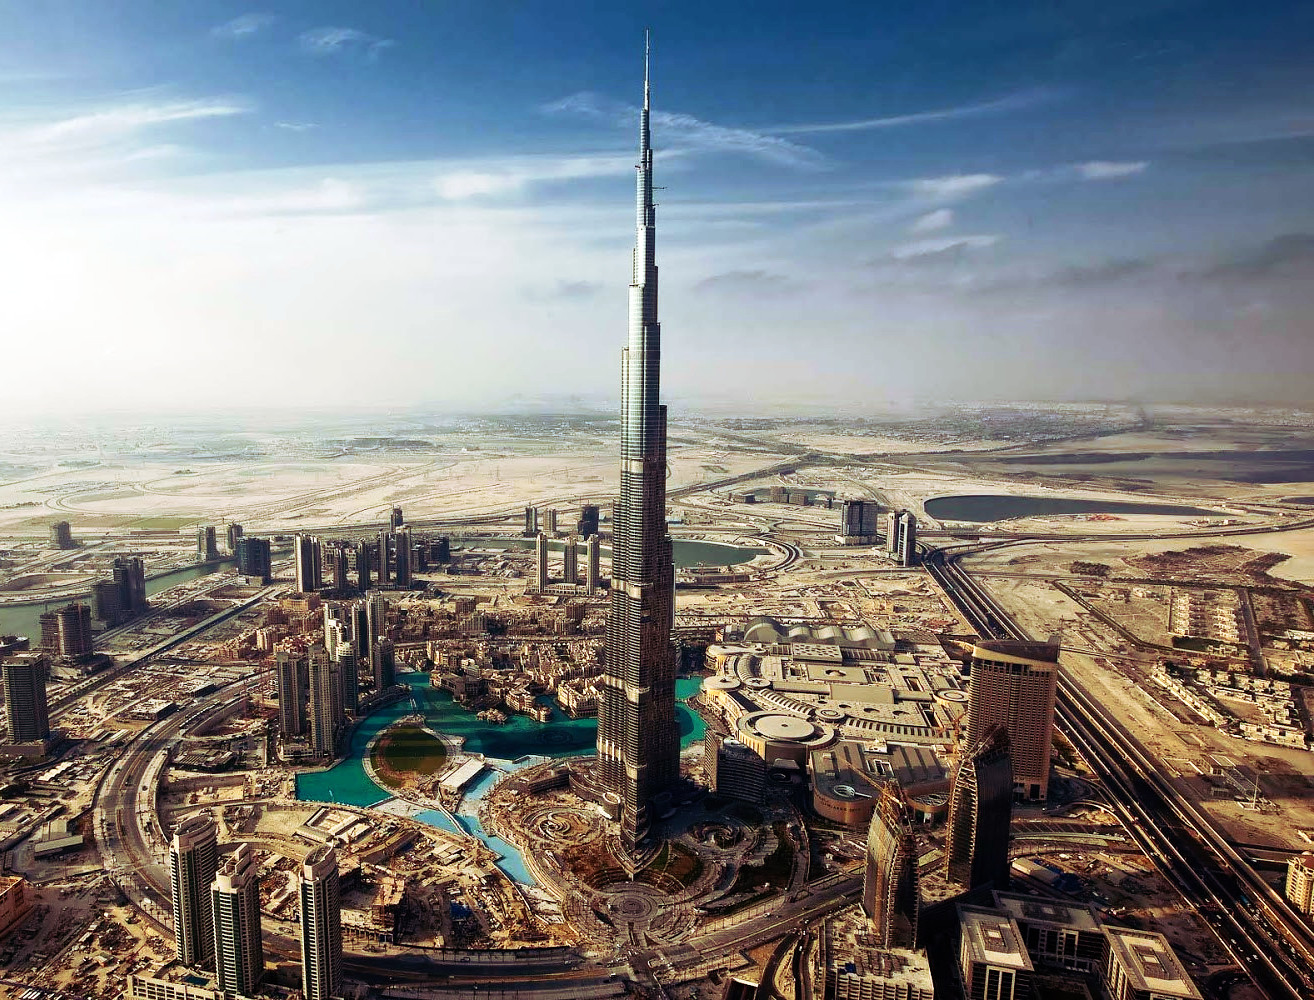 Burj Khalifa Tower in Dubai, UAE